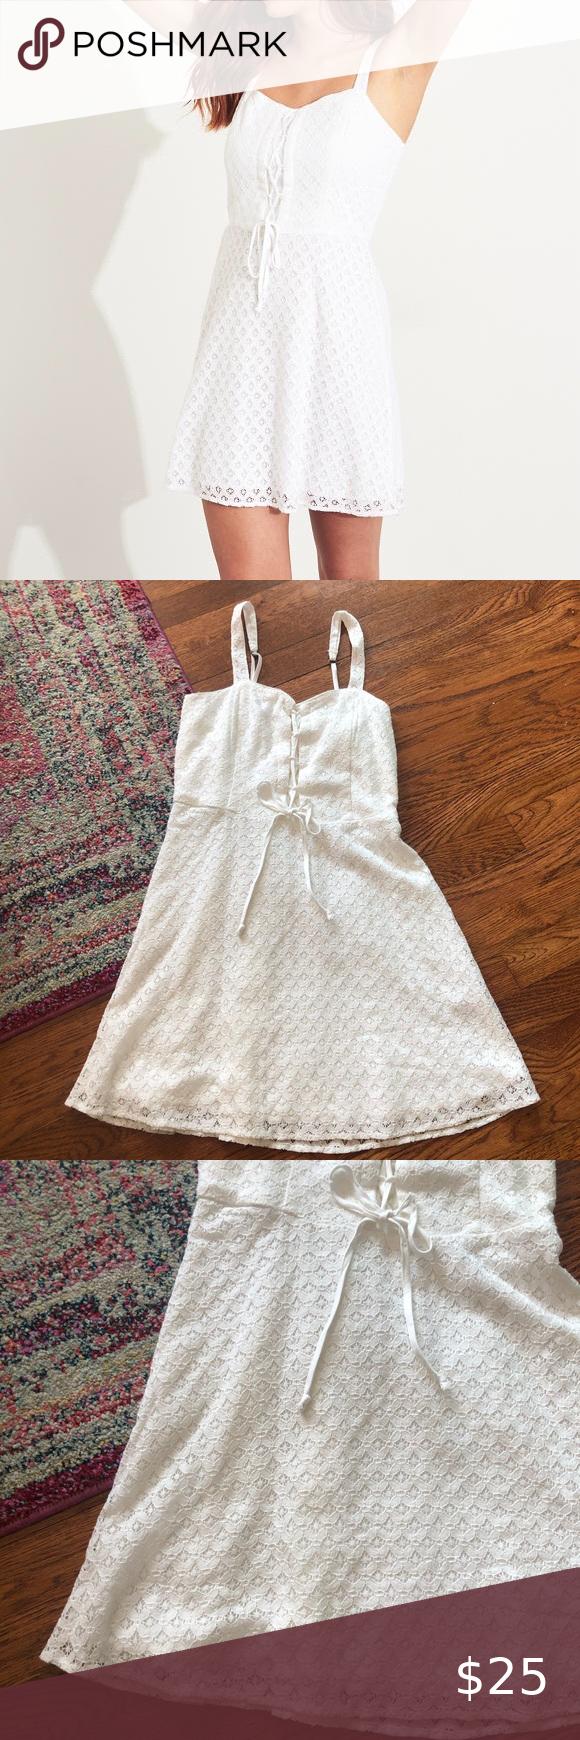 Hollister White Lace A Line Lace Up Mini Dress Hollister White Lace A Line Lace Up Mini Dress Size Small Approx 32 Inches Lon Mini Dress Dresses Clothes Design [ 1740 x 580 Pixel ]